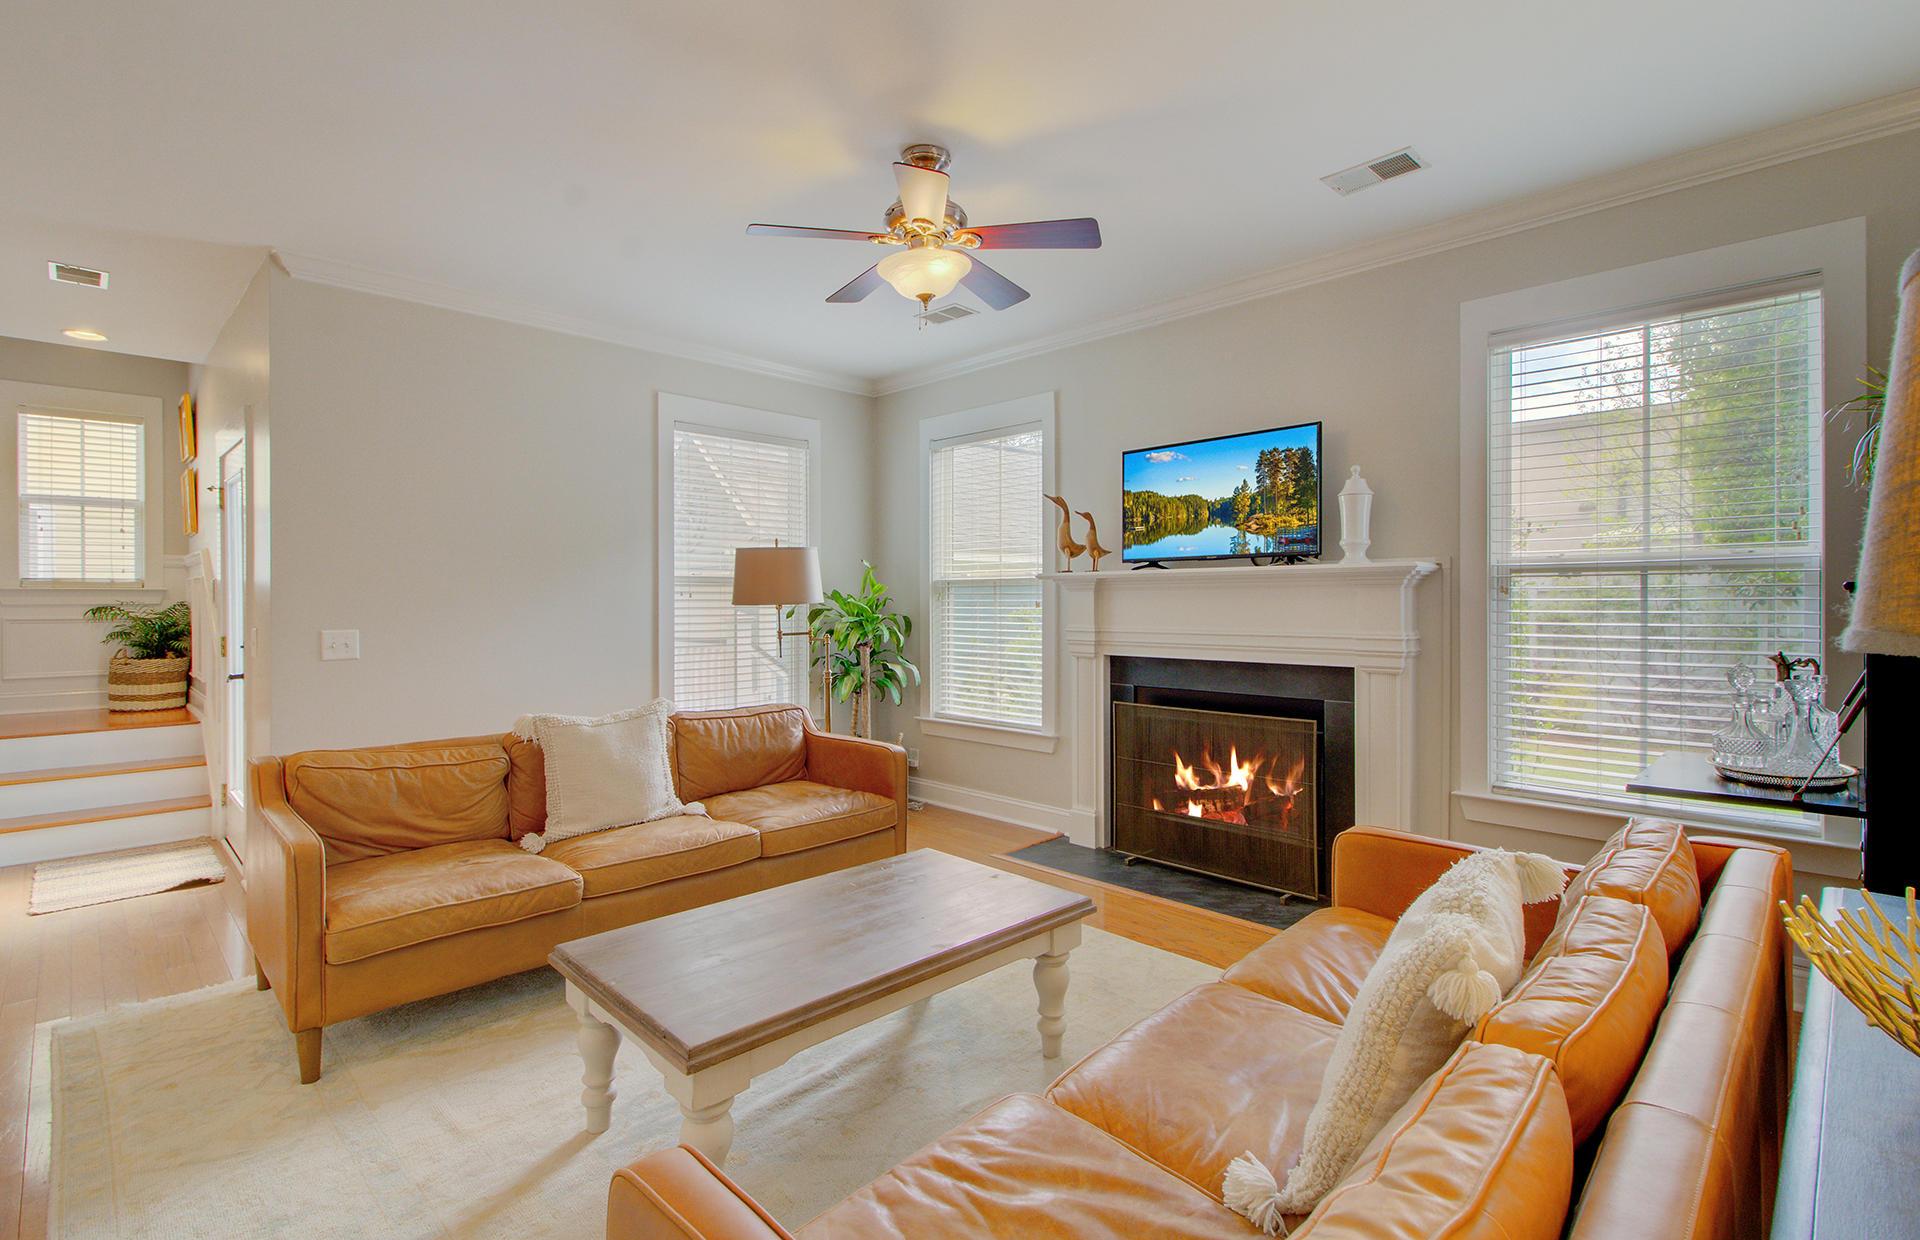 New Parrish Village Homes For Sale - 1109 Dawn View, Mount Pleasant, SC - 15